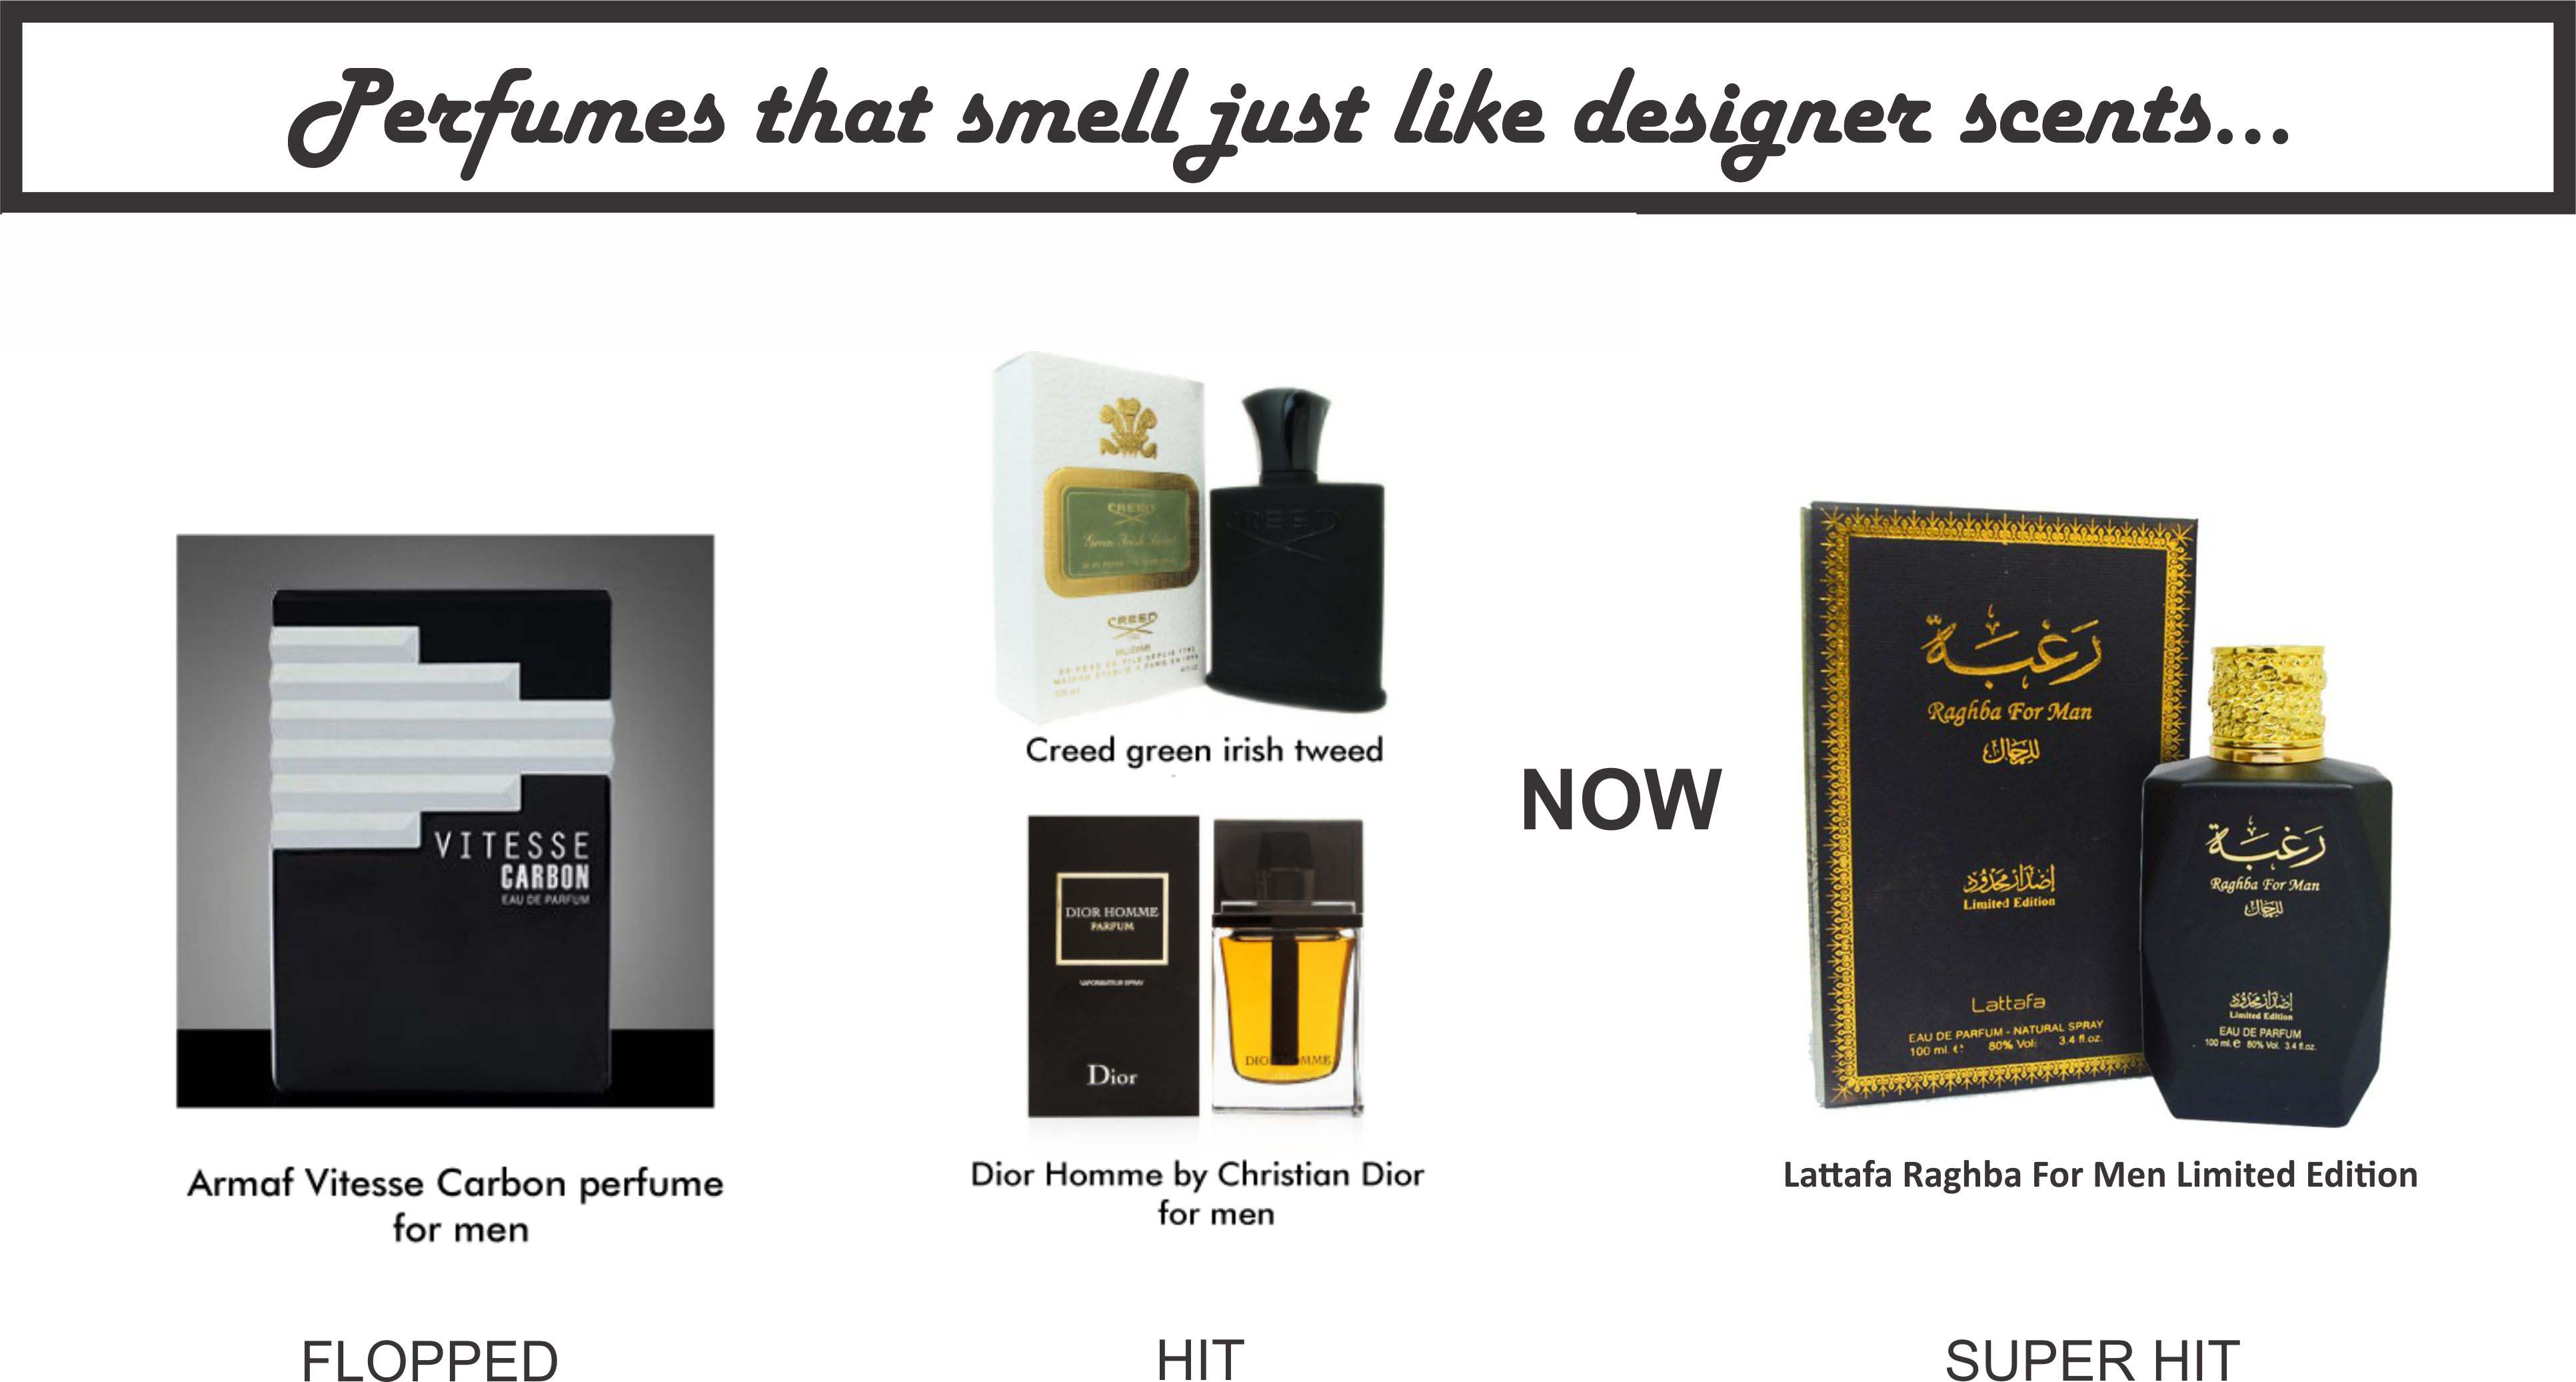 armaf-vitesse-carbon-perfume-men-creed-green-irish-tweed-dior-homme-by-christian-dior-lattafa-raghba-perfume